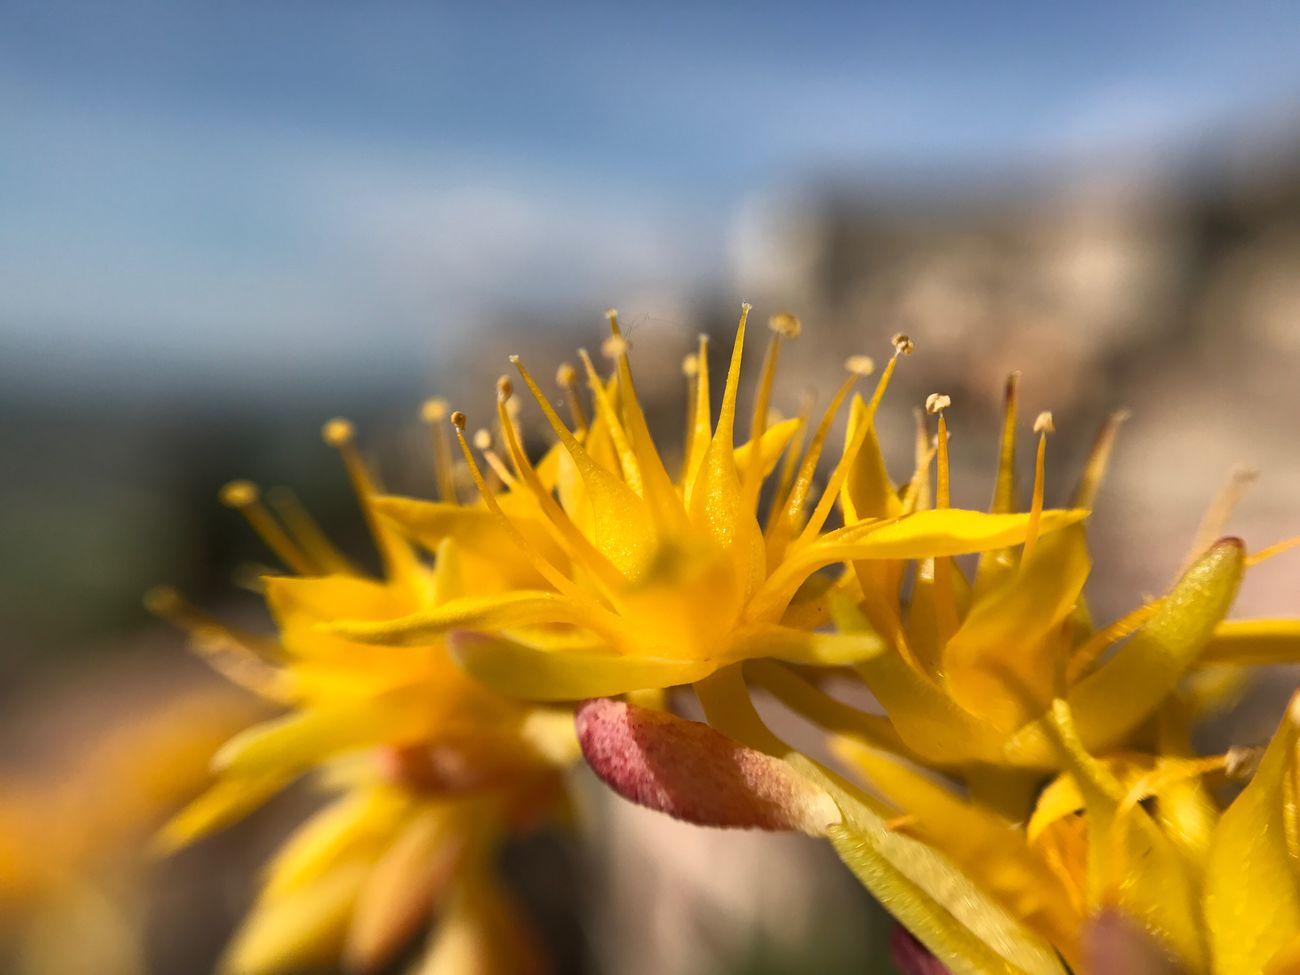 Macro Macro Photography Flower Yellow Yellow Flower Nature Floweroftheday Picoftheday Photo Photography Amazing Outdoors Springtime Todi  Umbria, Italy Italia Flower Head